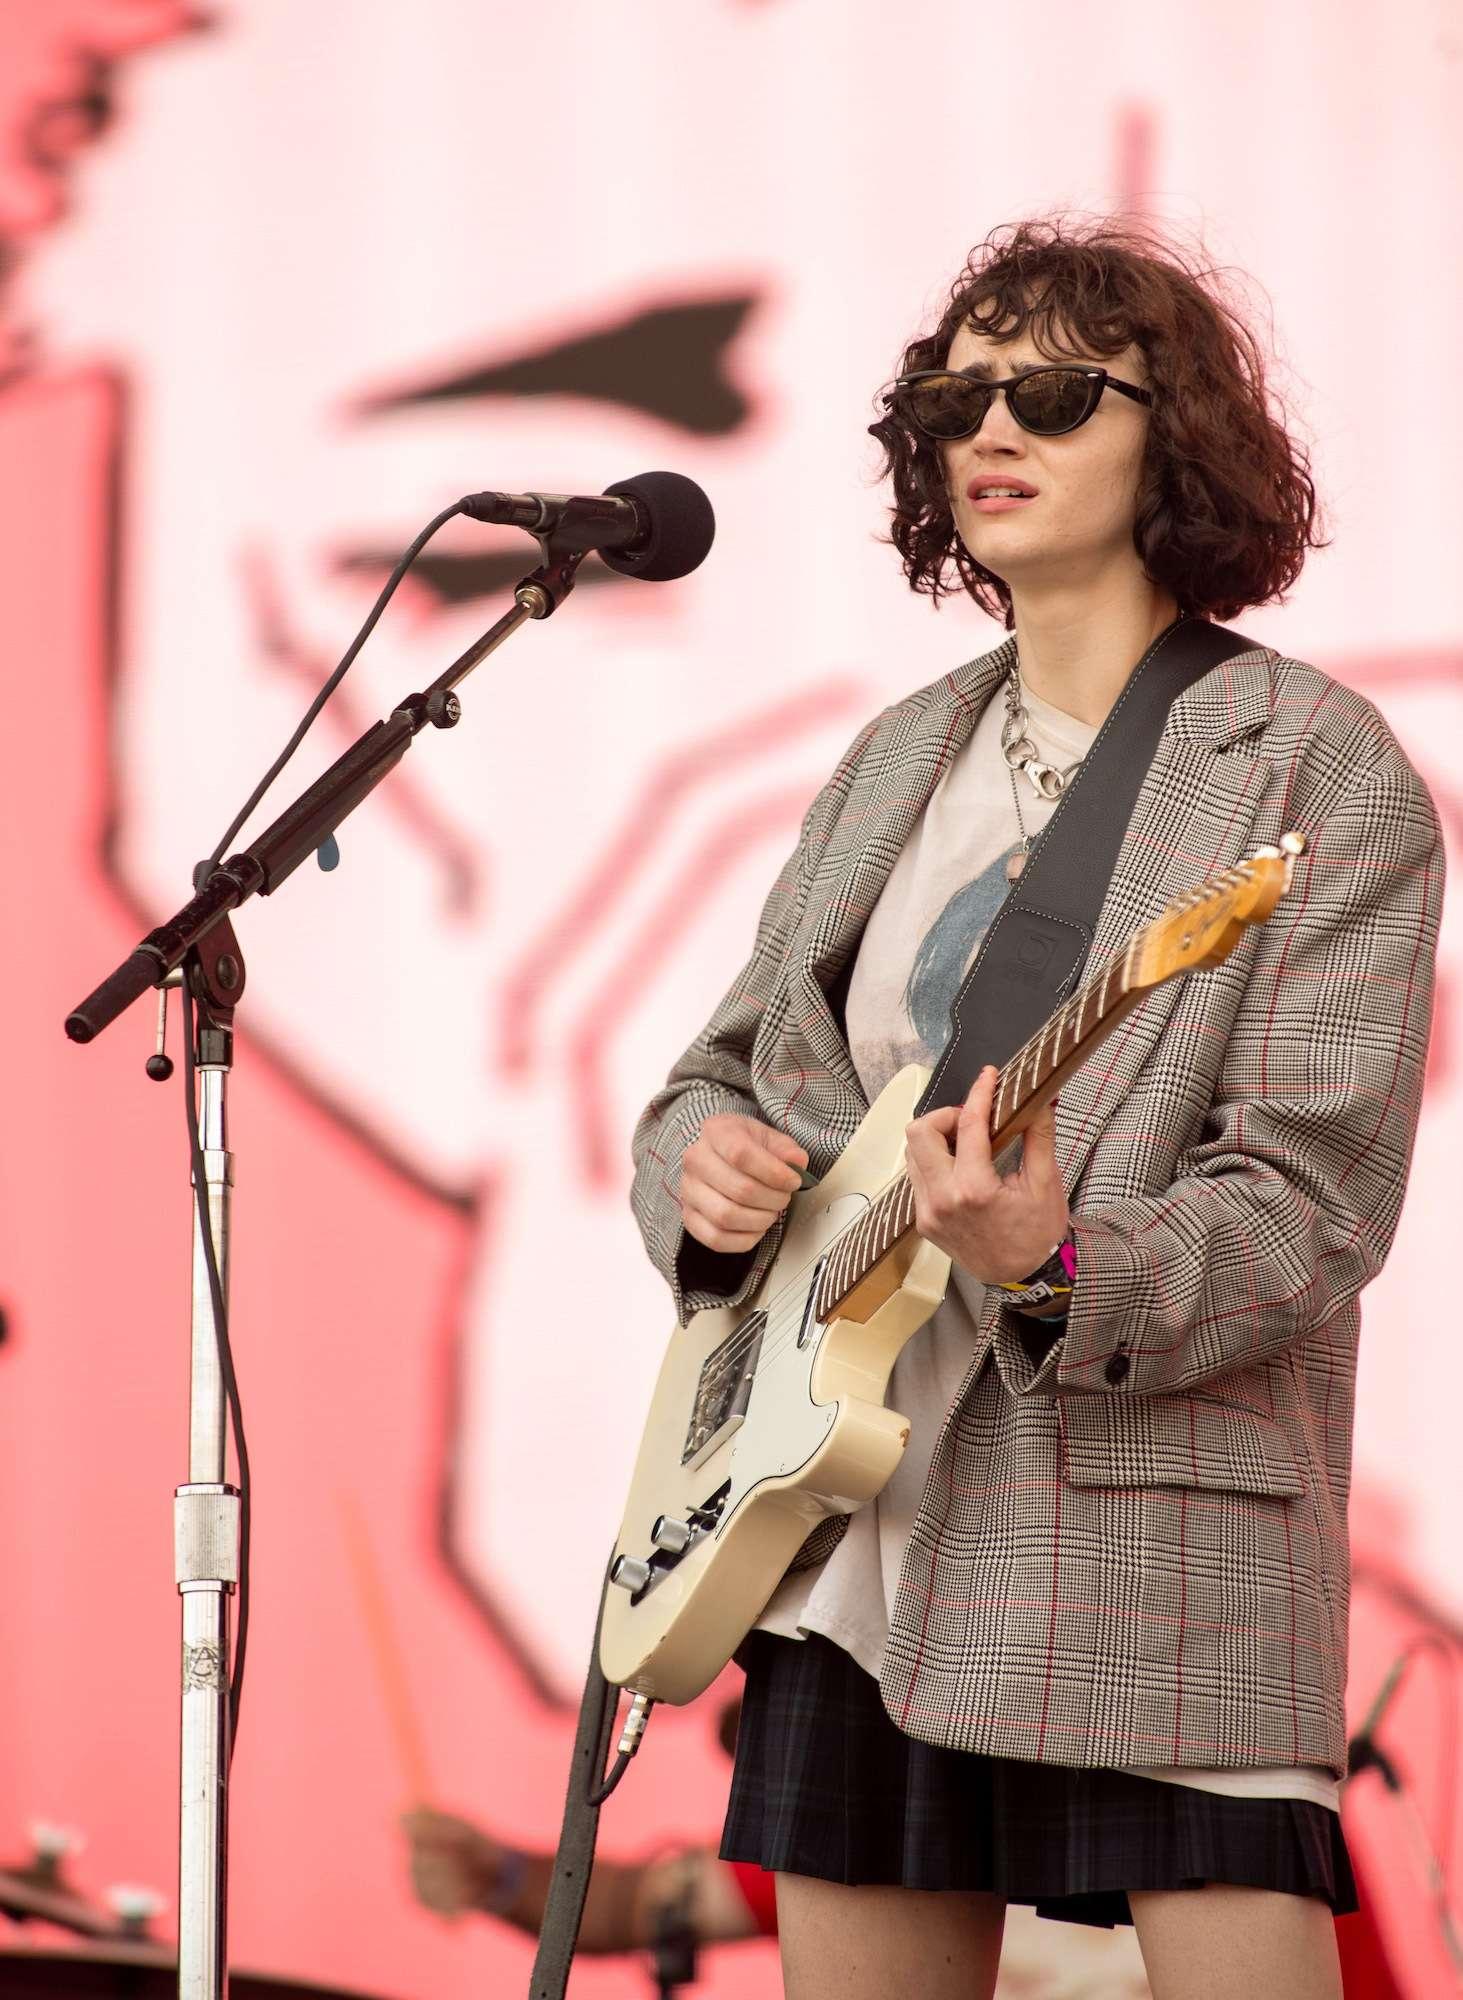 Sir Chloe Live at Lollapalooza [GALLERY] 11